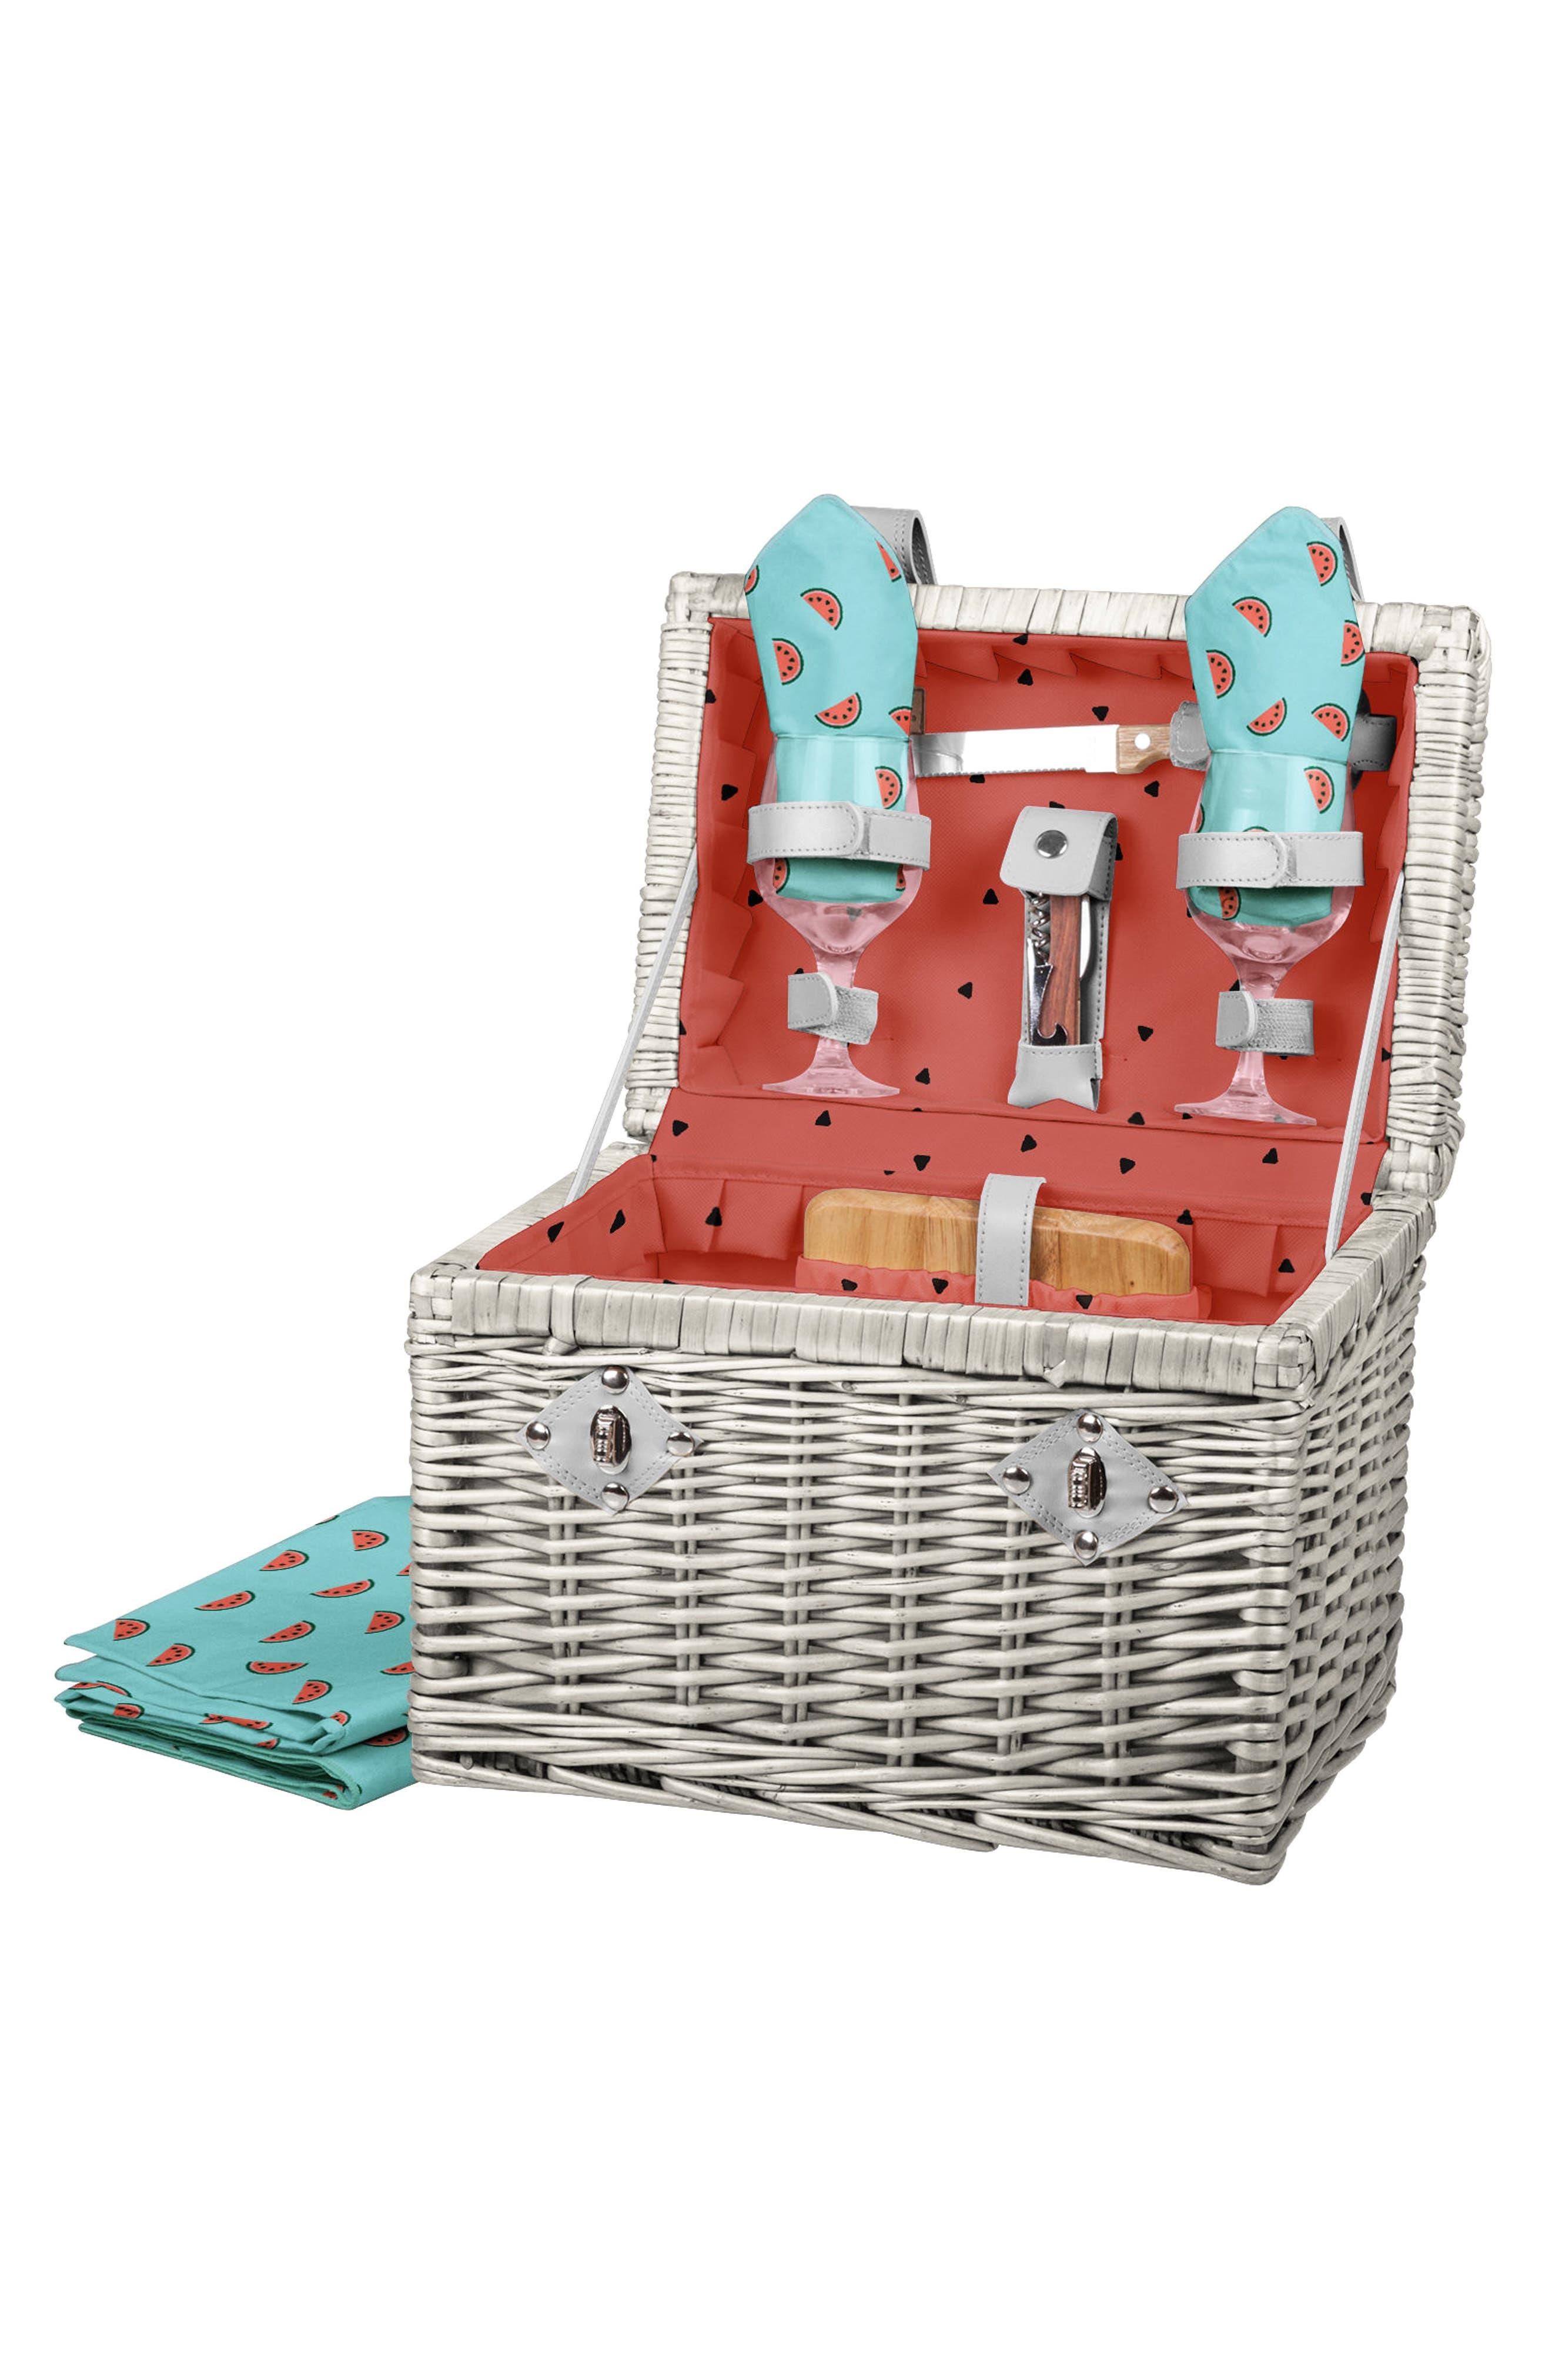 Main Image - Picnic Time Napa Wicker Wine & Cheese Basket